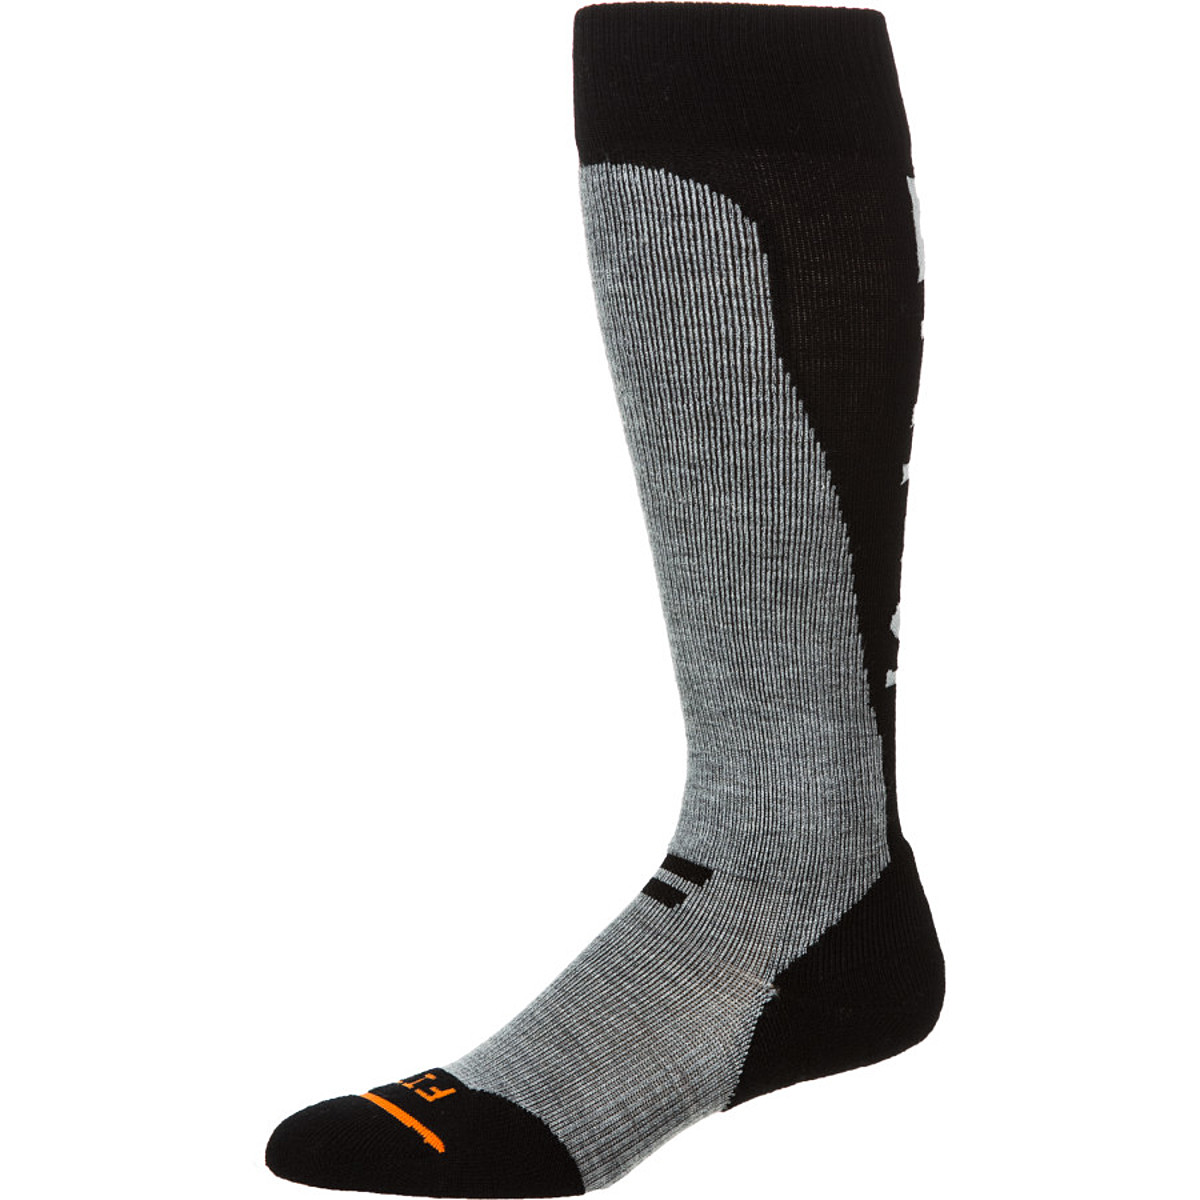 FITS Sock Light Ski Socks